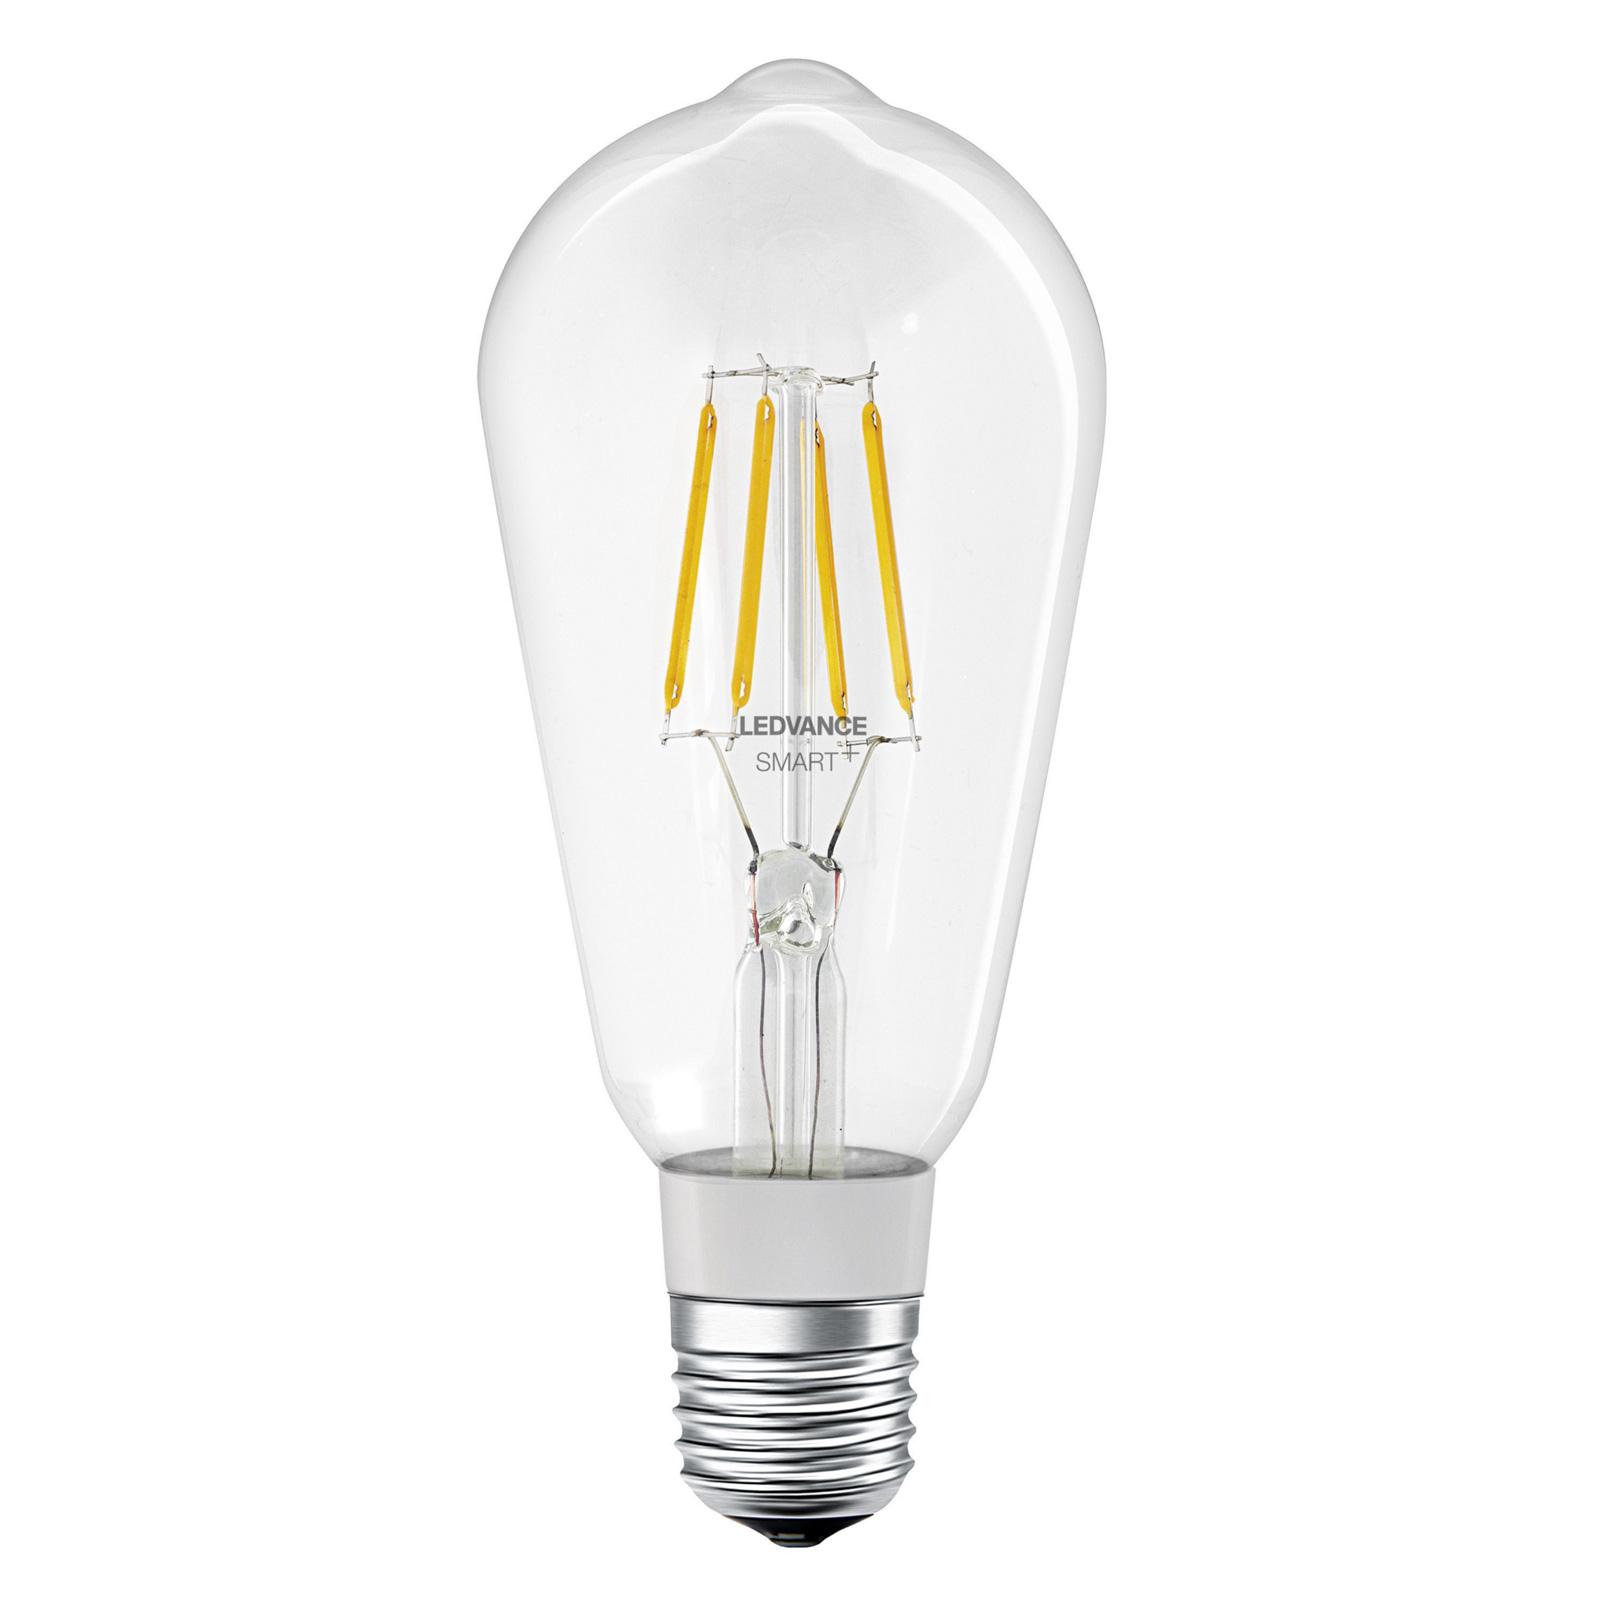 LEDVANCE SMART+ Bluetooth E27 Edison 5,5W 2 700 K